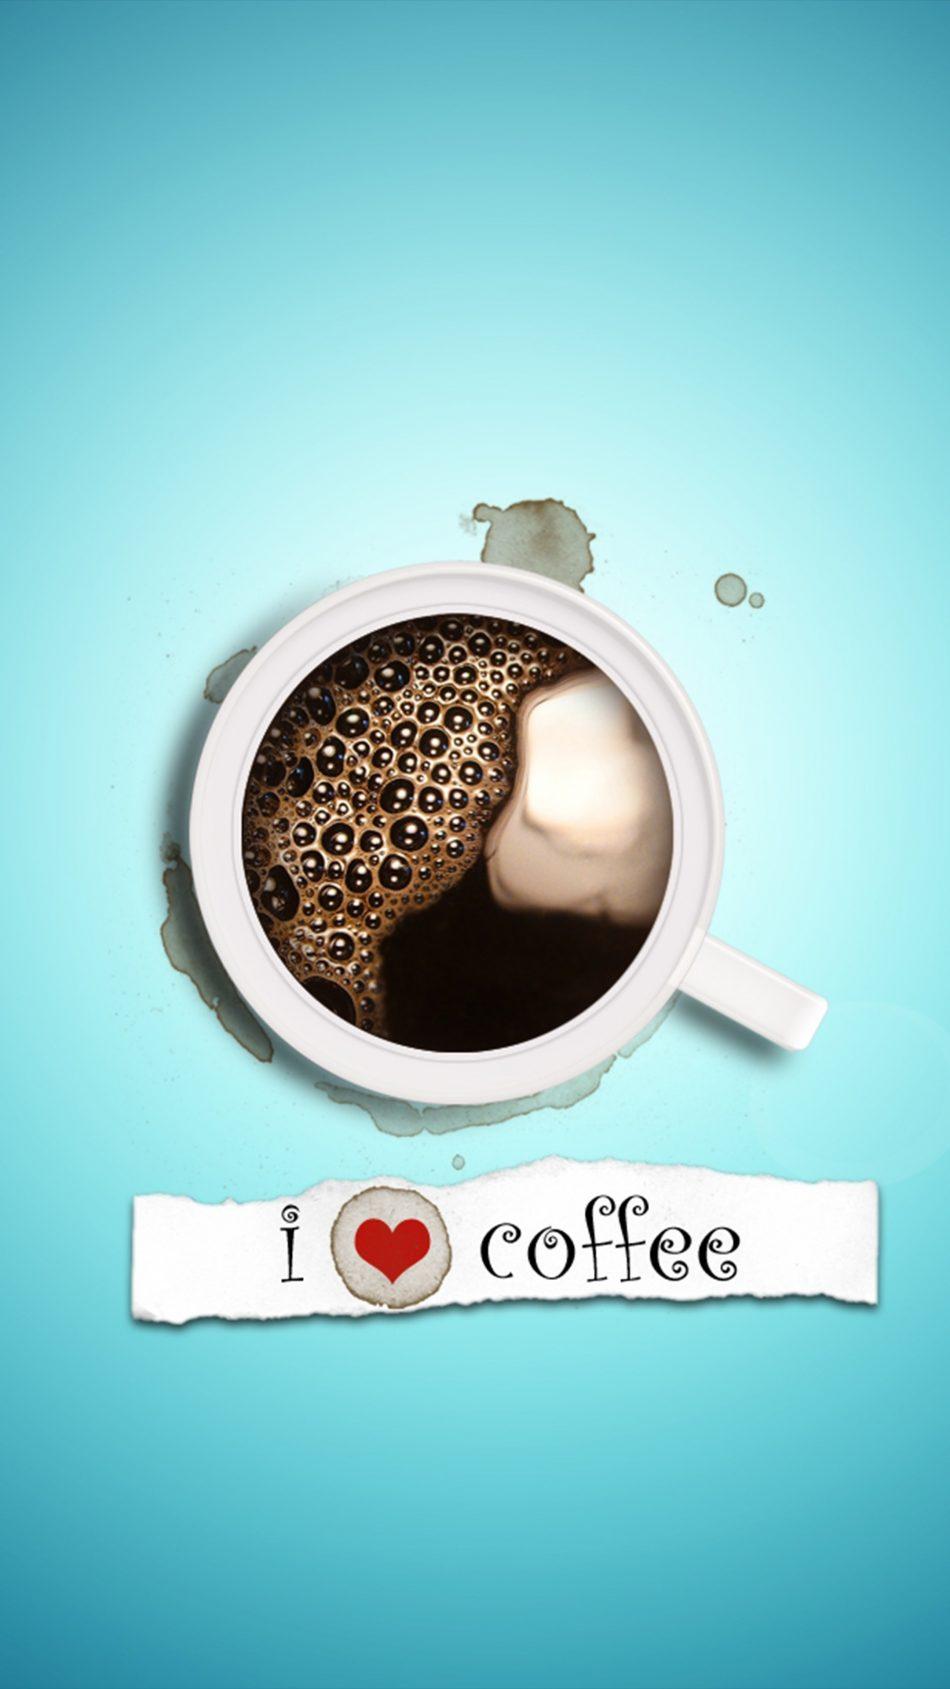 I Love Coffee 4K Ultra HD Mobile Wallpaper